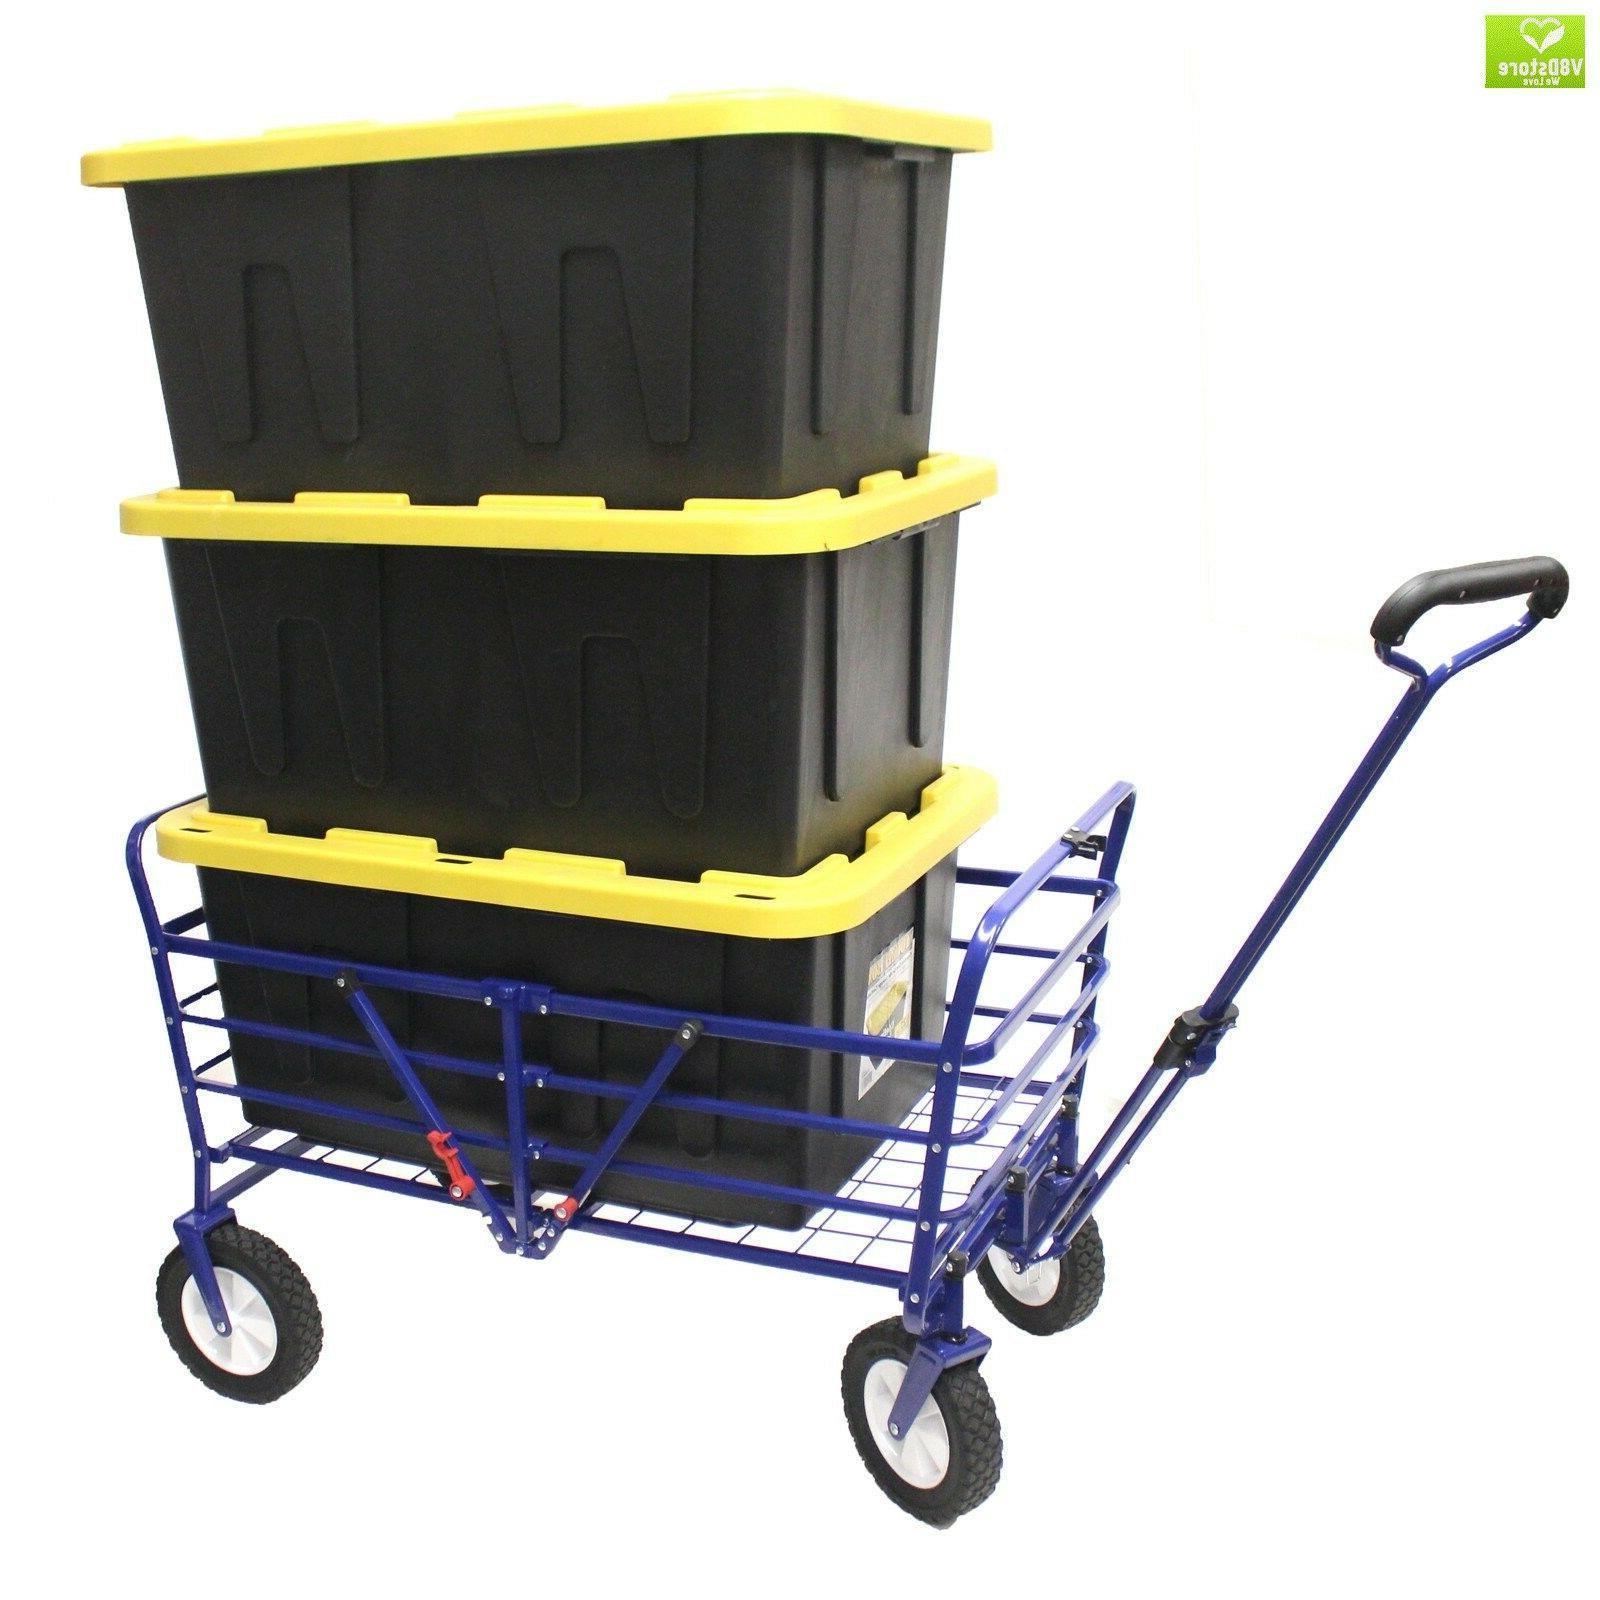 WonderFold 2-in-1 Heavy Folding Wagon Ga